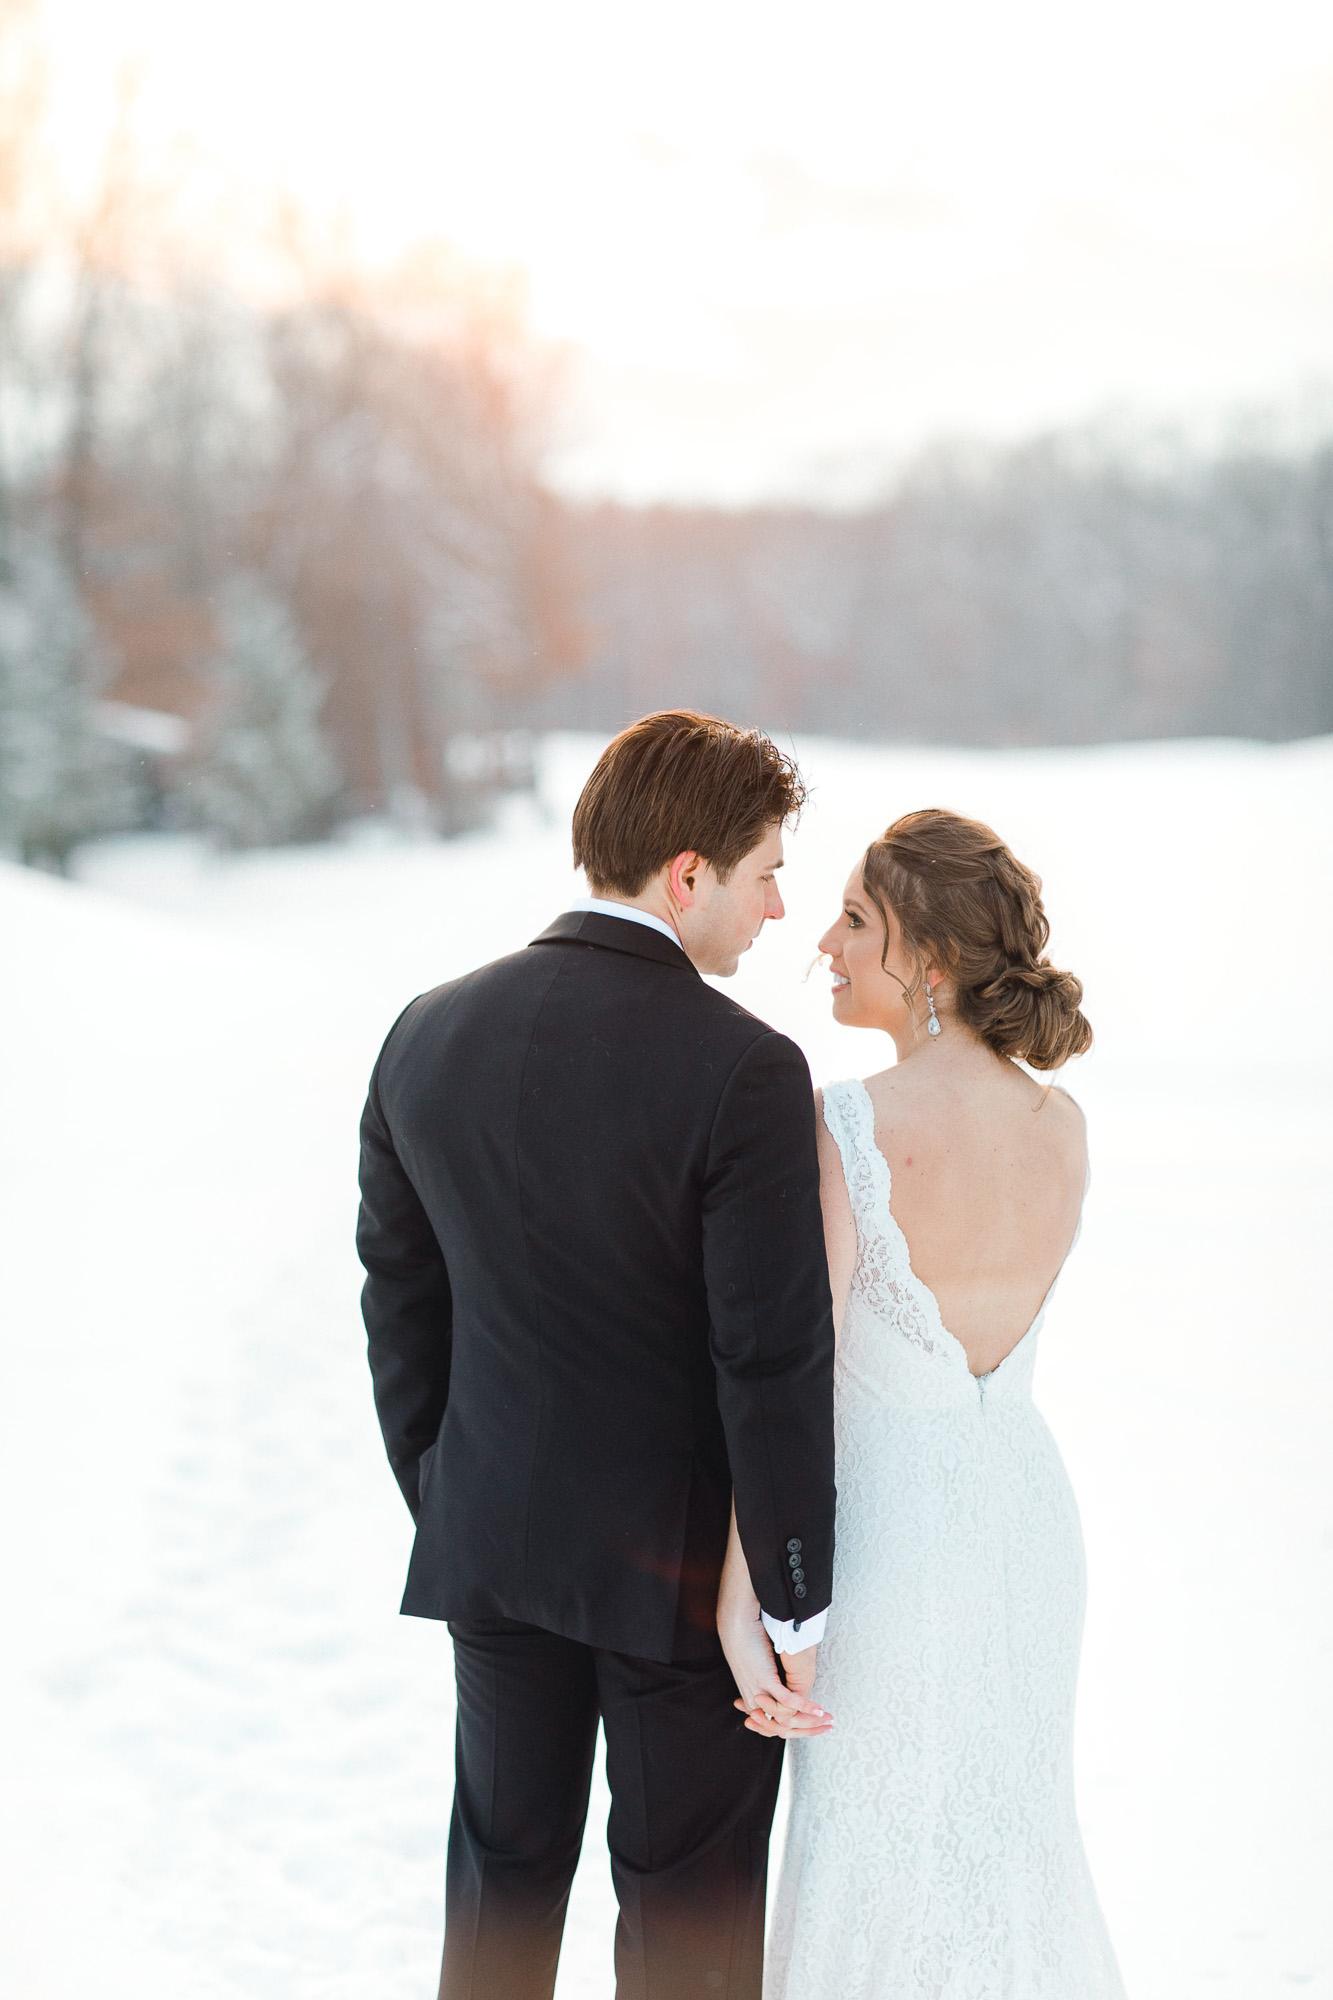 snowy-sand-springs-country-club-drums-pa-christmas-wedding-24913.jpg